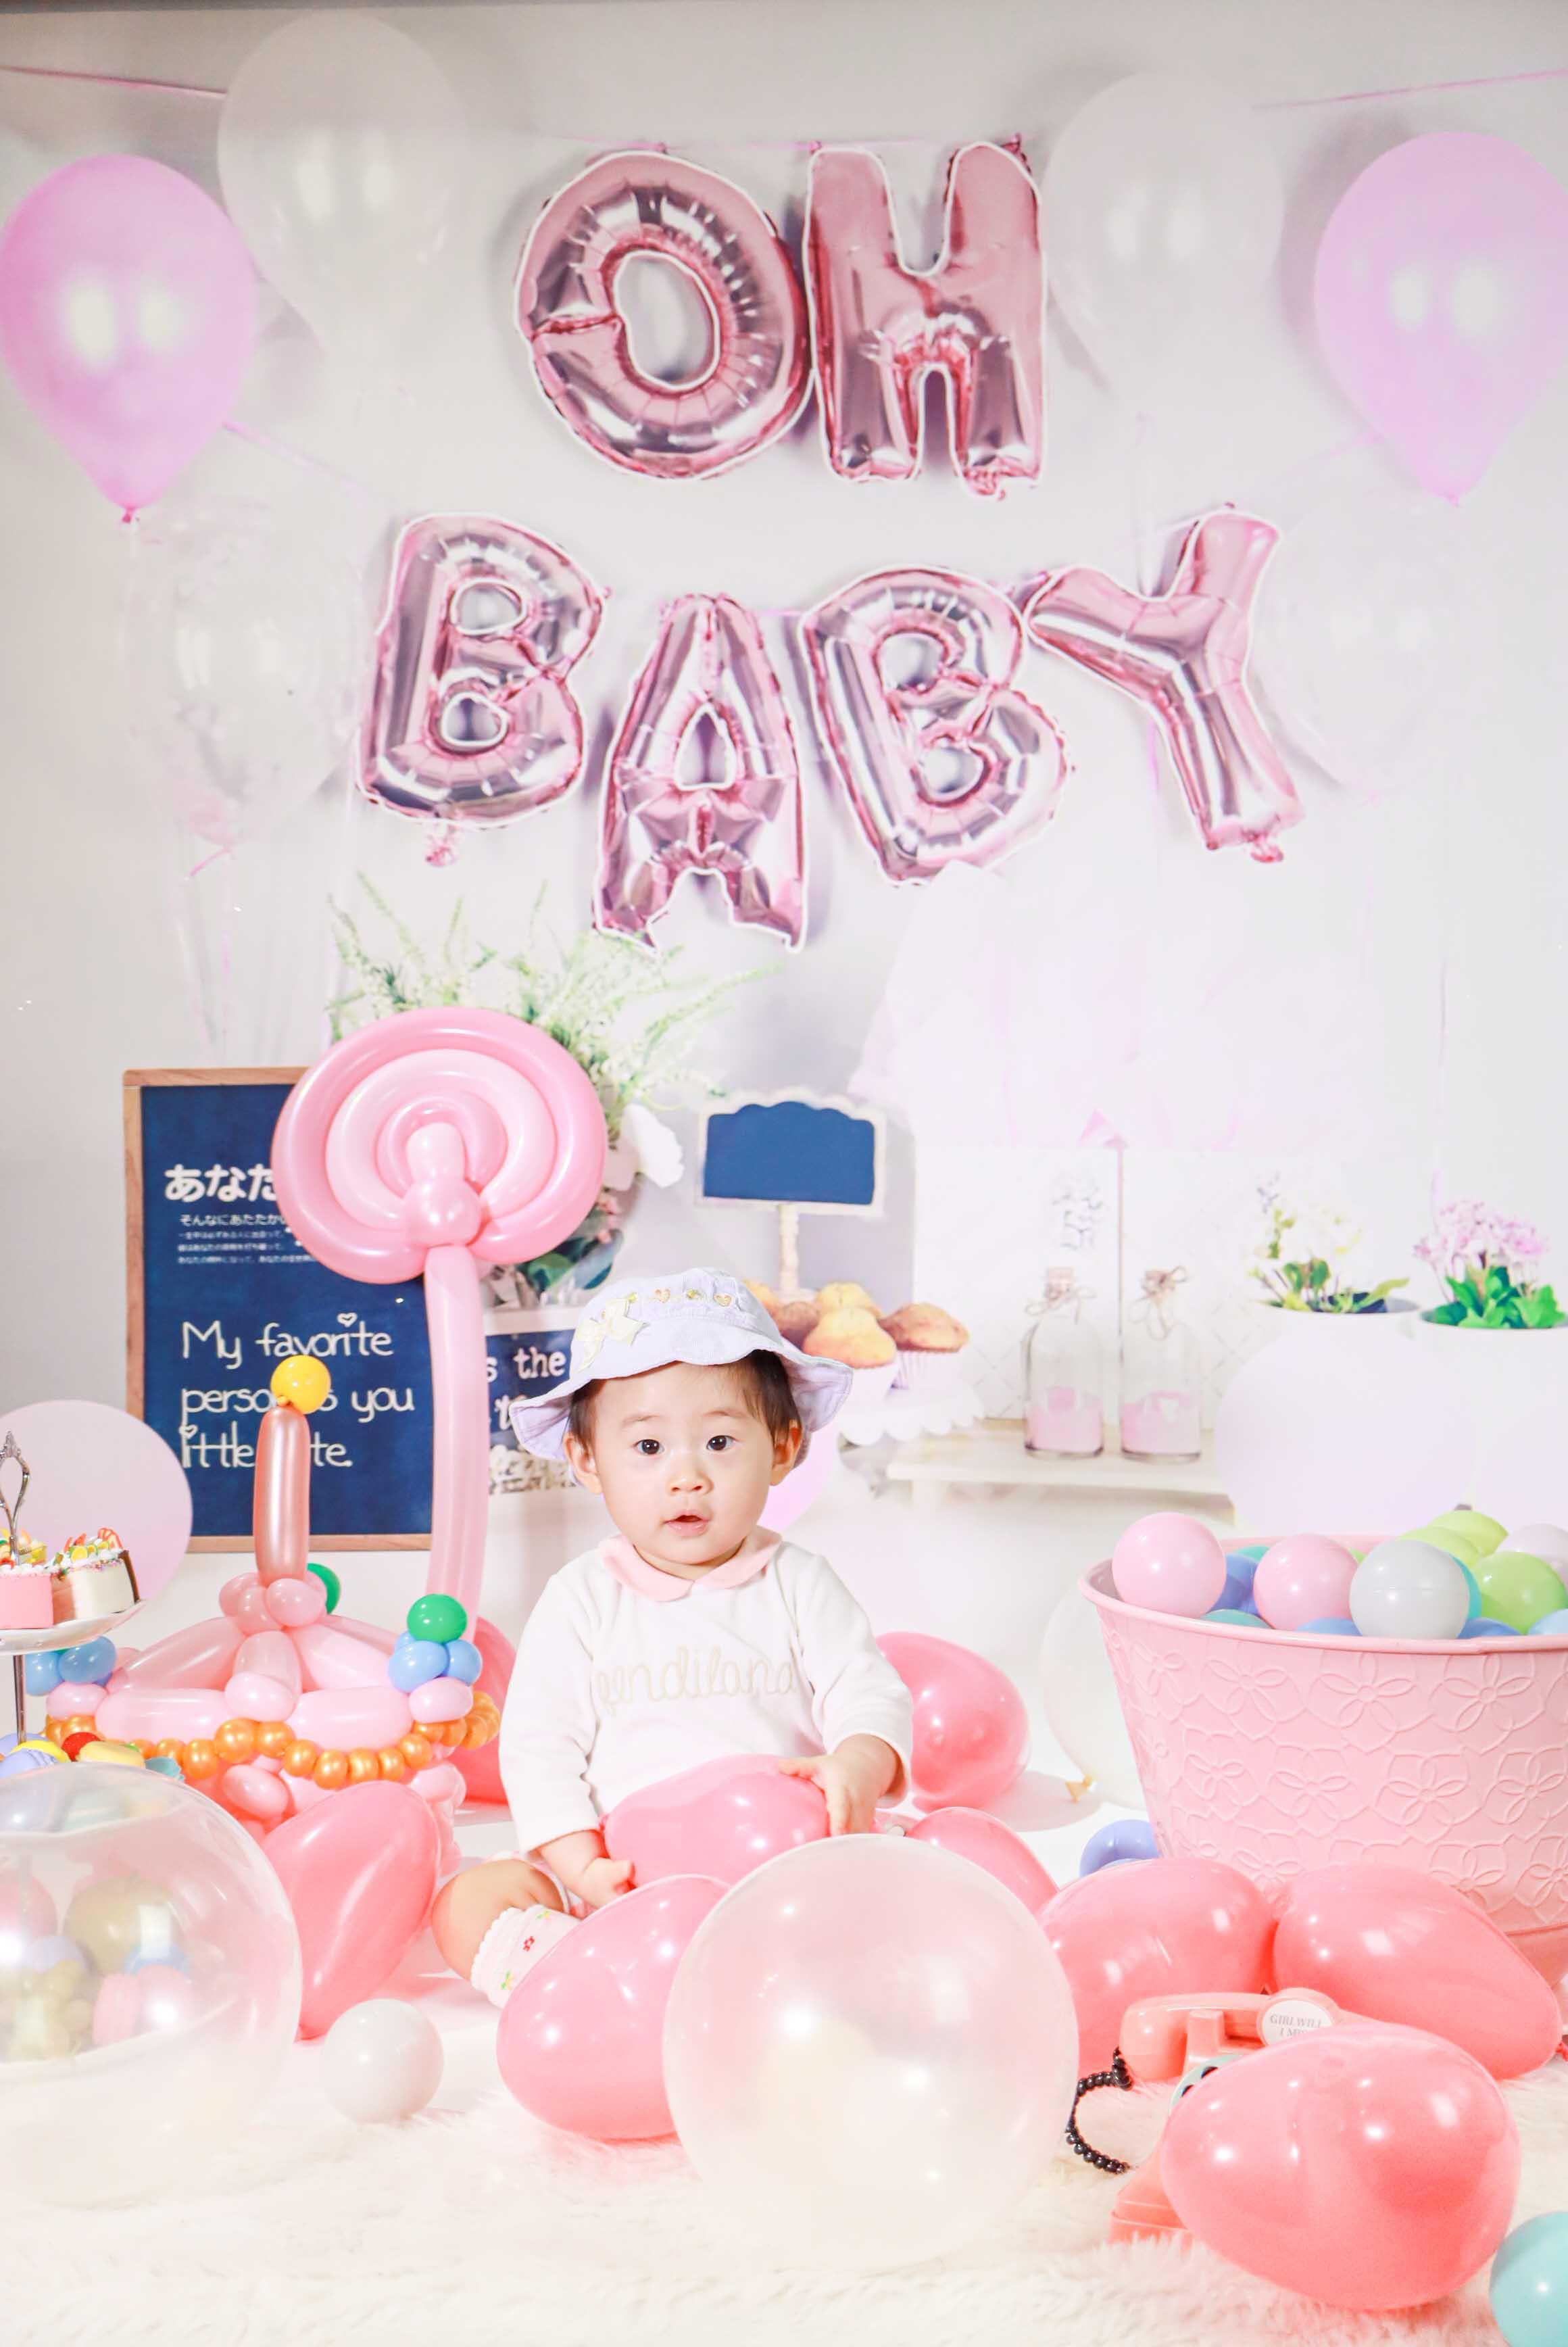 影bb相推介 1歲bb攝介紹 影BB造型 嬰兒拍攝影邊間好 上門初生嬰兒攝影 家庭相影樓 Top good best baby photo photography New born in hong kong hk inspire baby studio-7